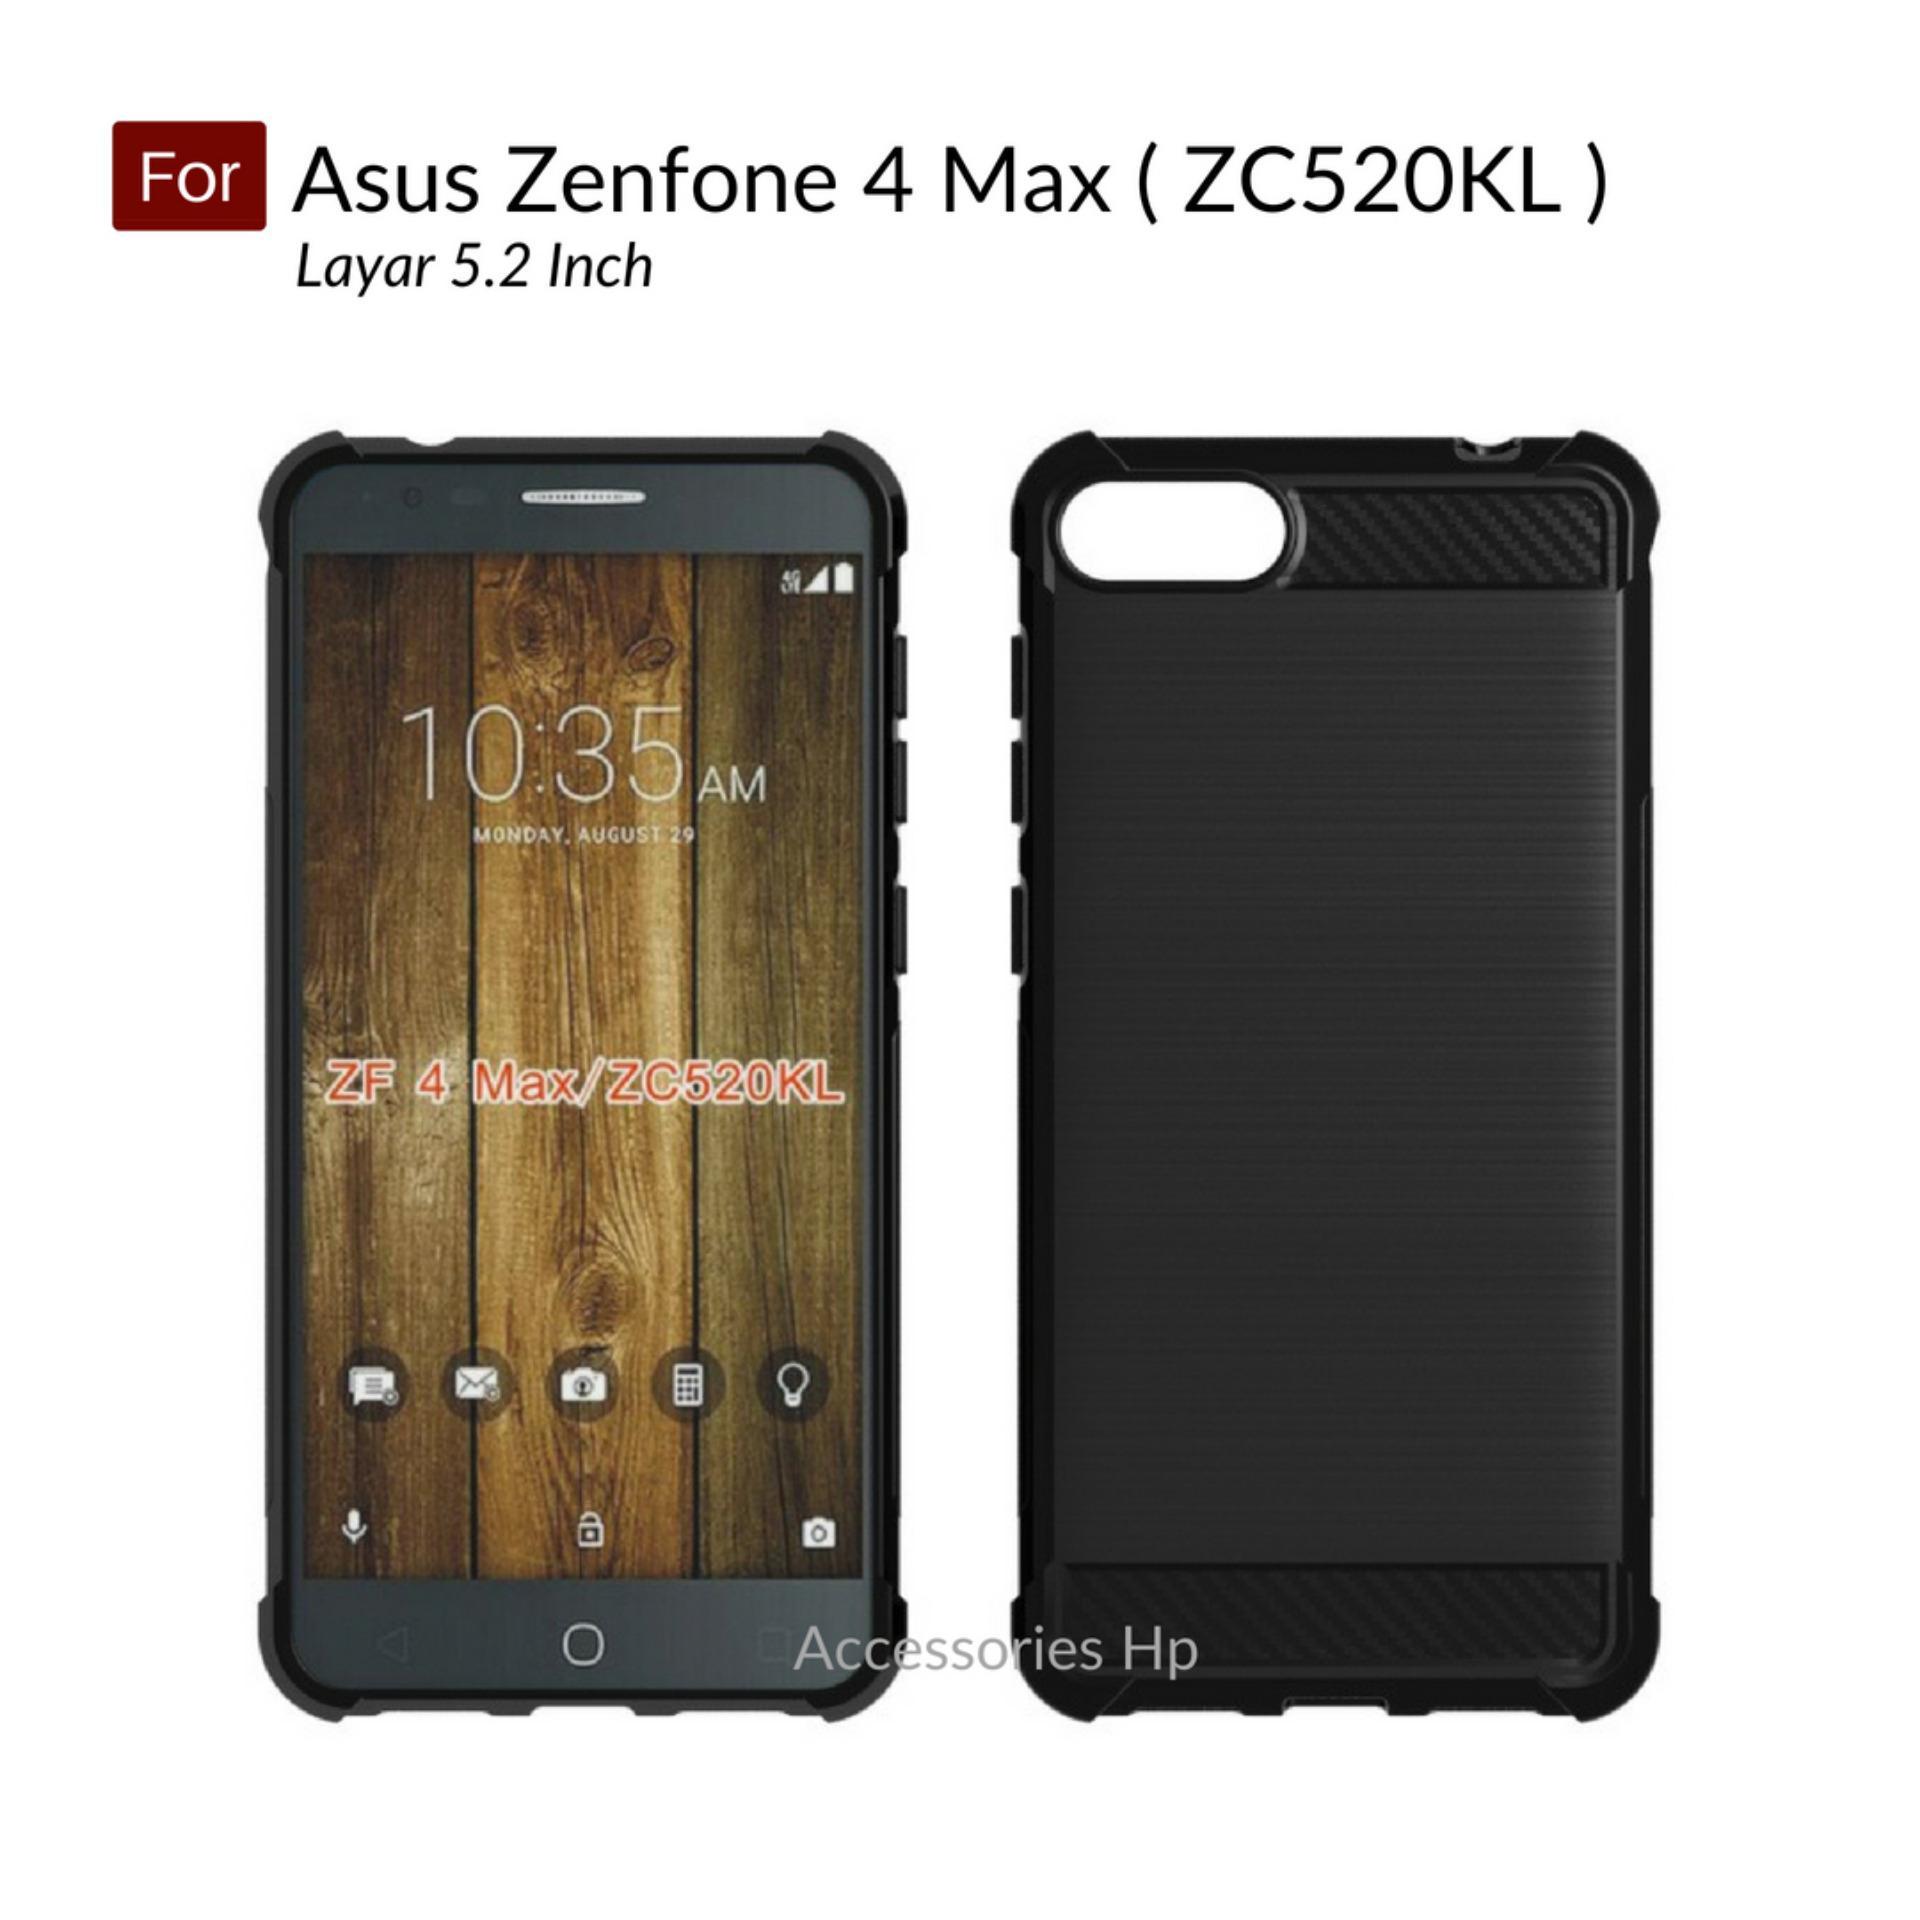 Accessories Hp Brushed Carbon Crack Case Asus Zenfone 4 Max 5.2 inch ( ZC520KL ) - Black